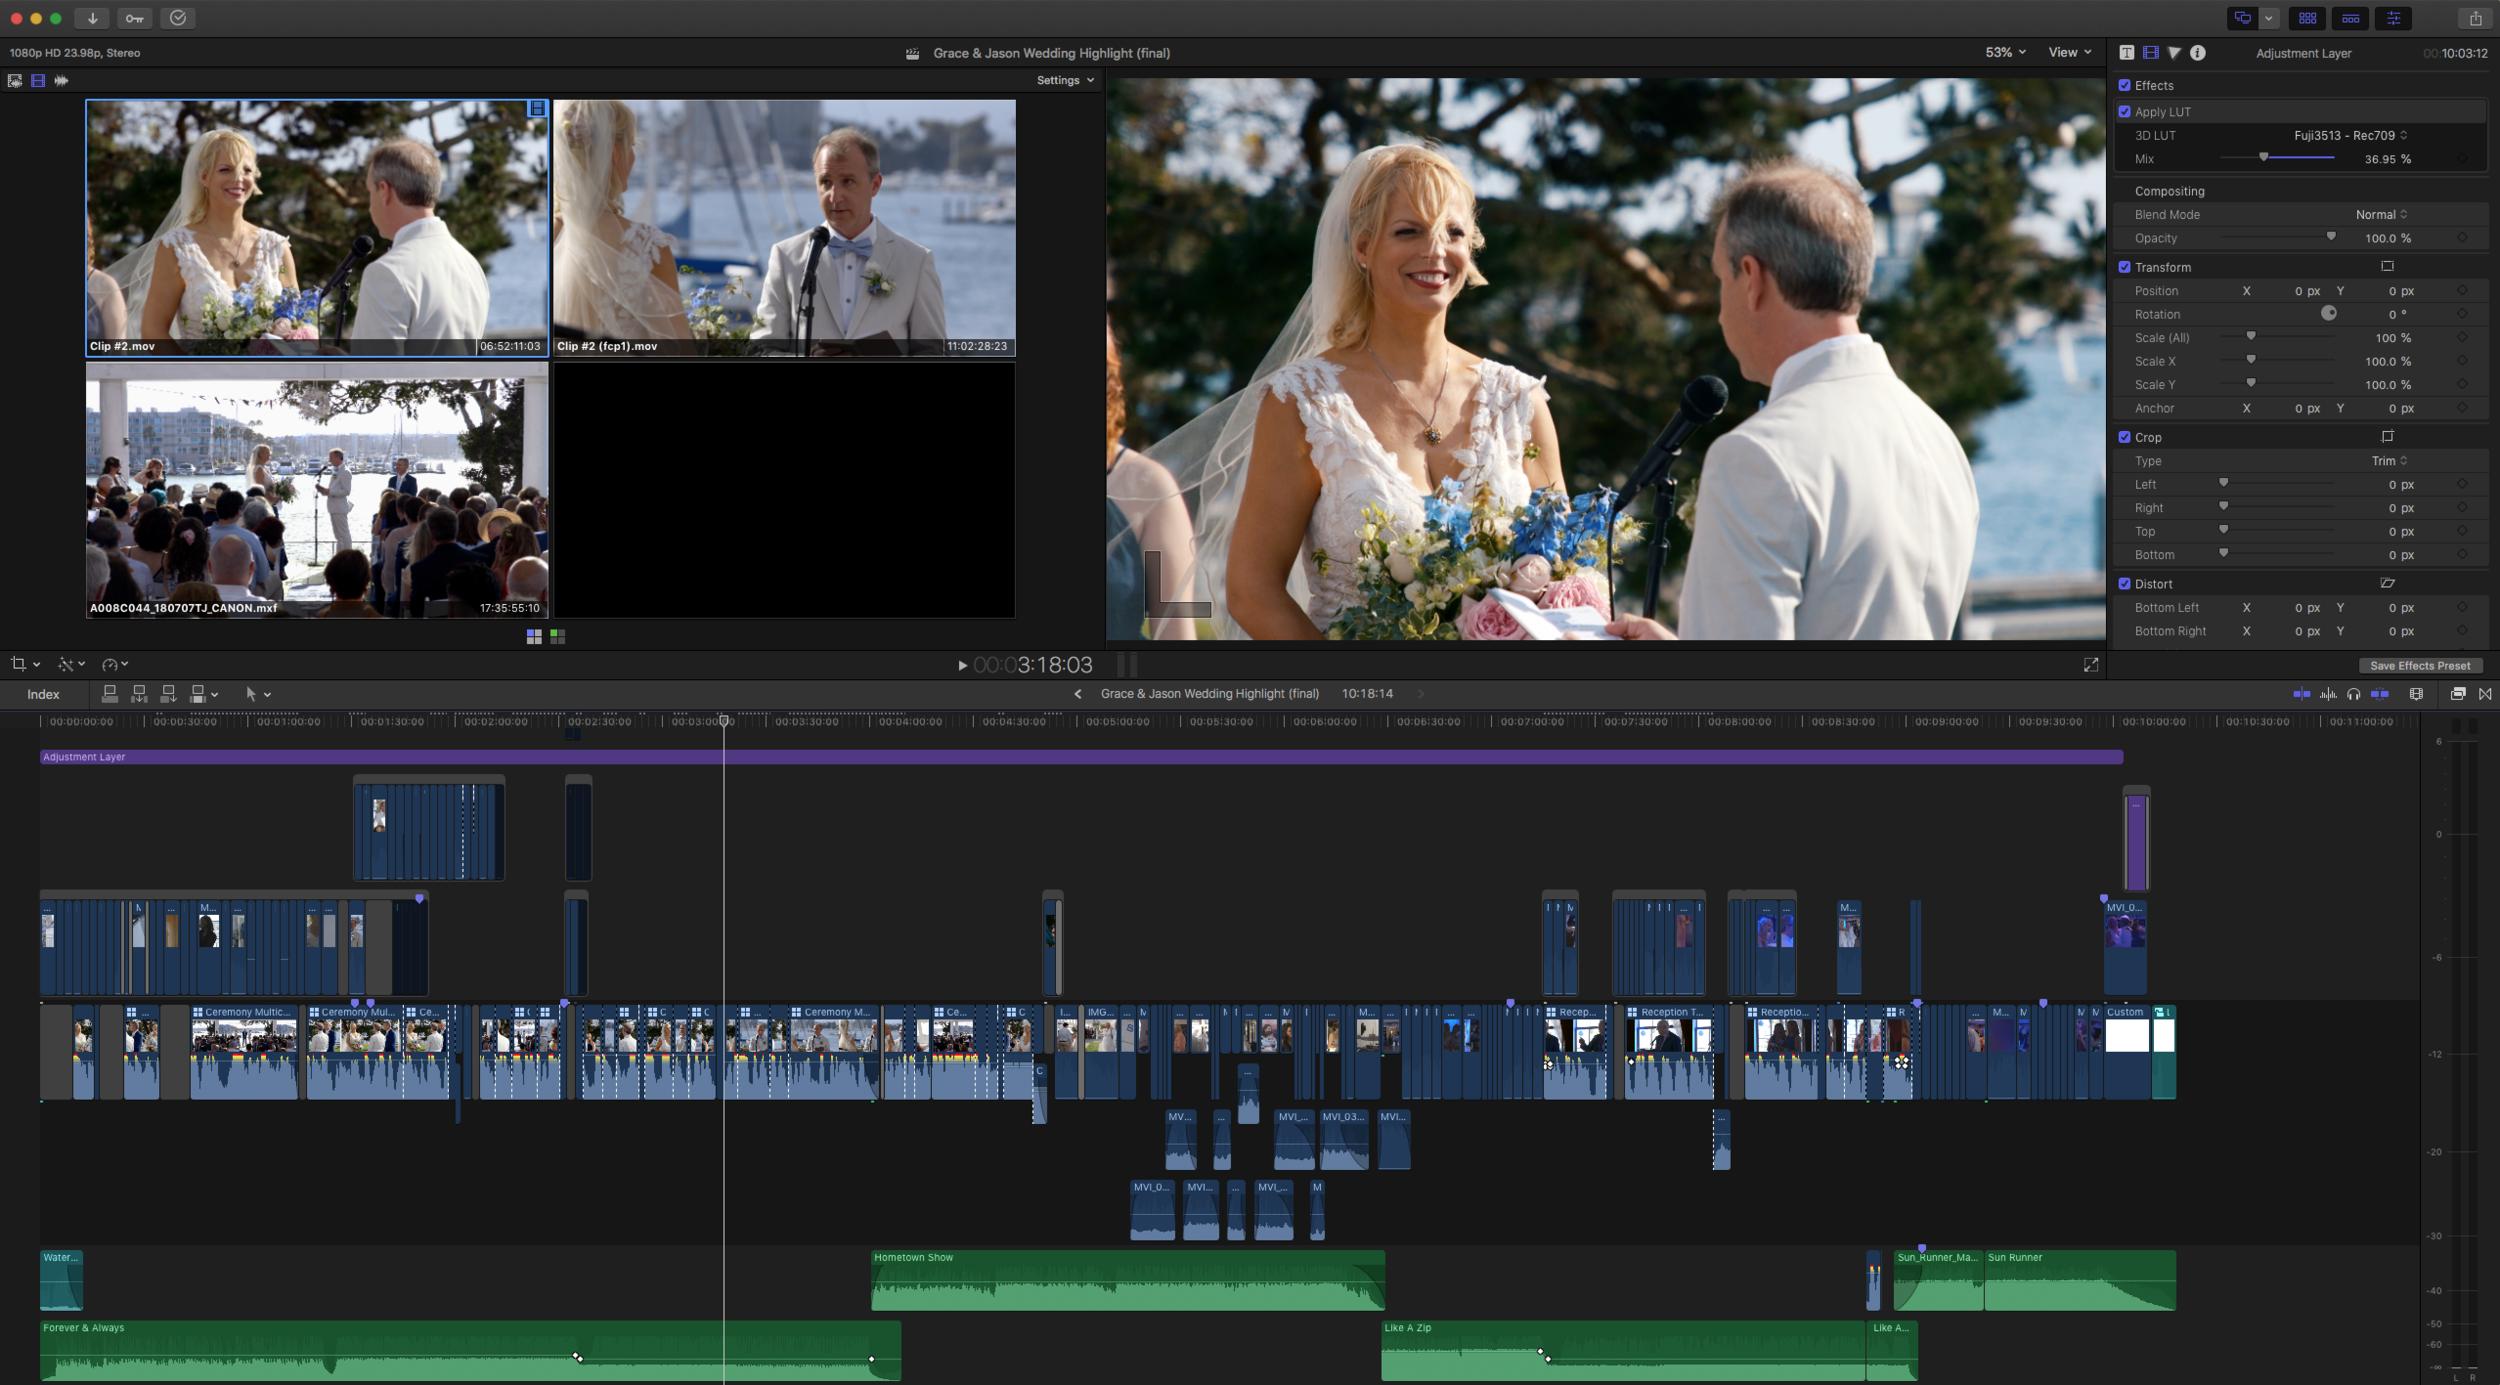 Wedding Ceremony multiple camera angles